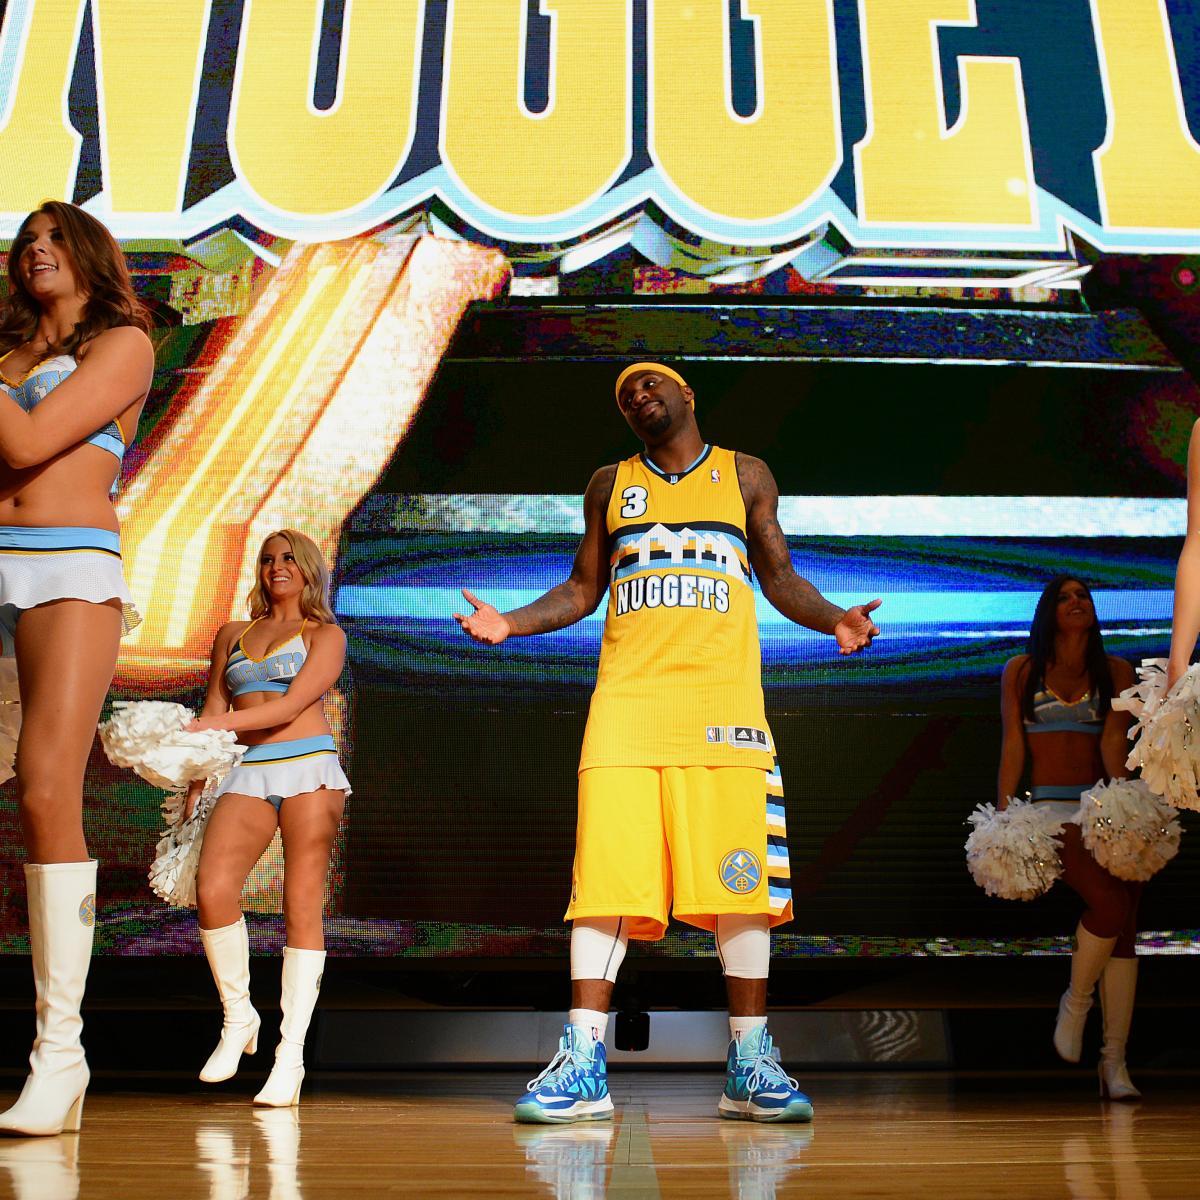 Denver News Golden: Denver Nuggets Preview 2013-14: Lineup, Roster Predictions